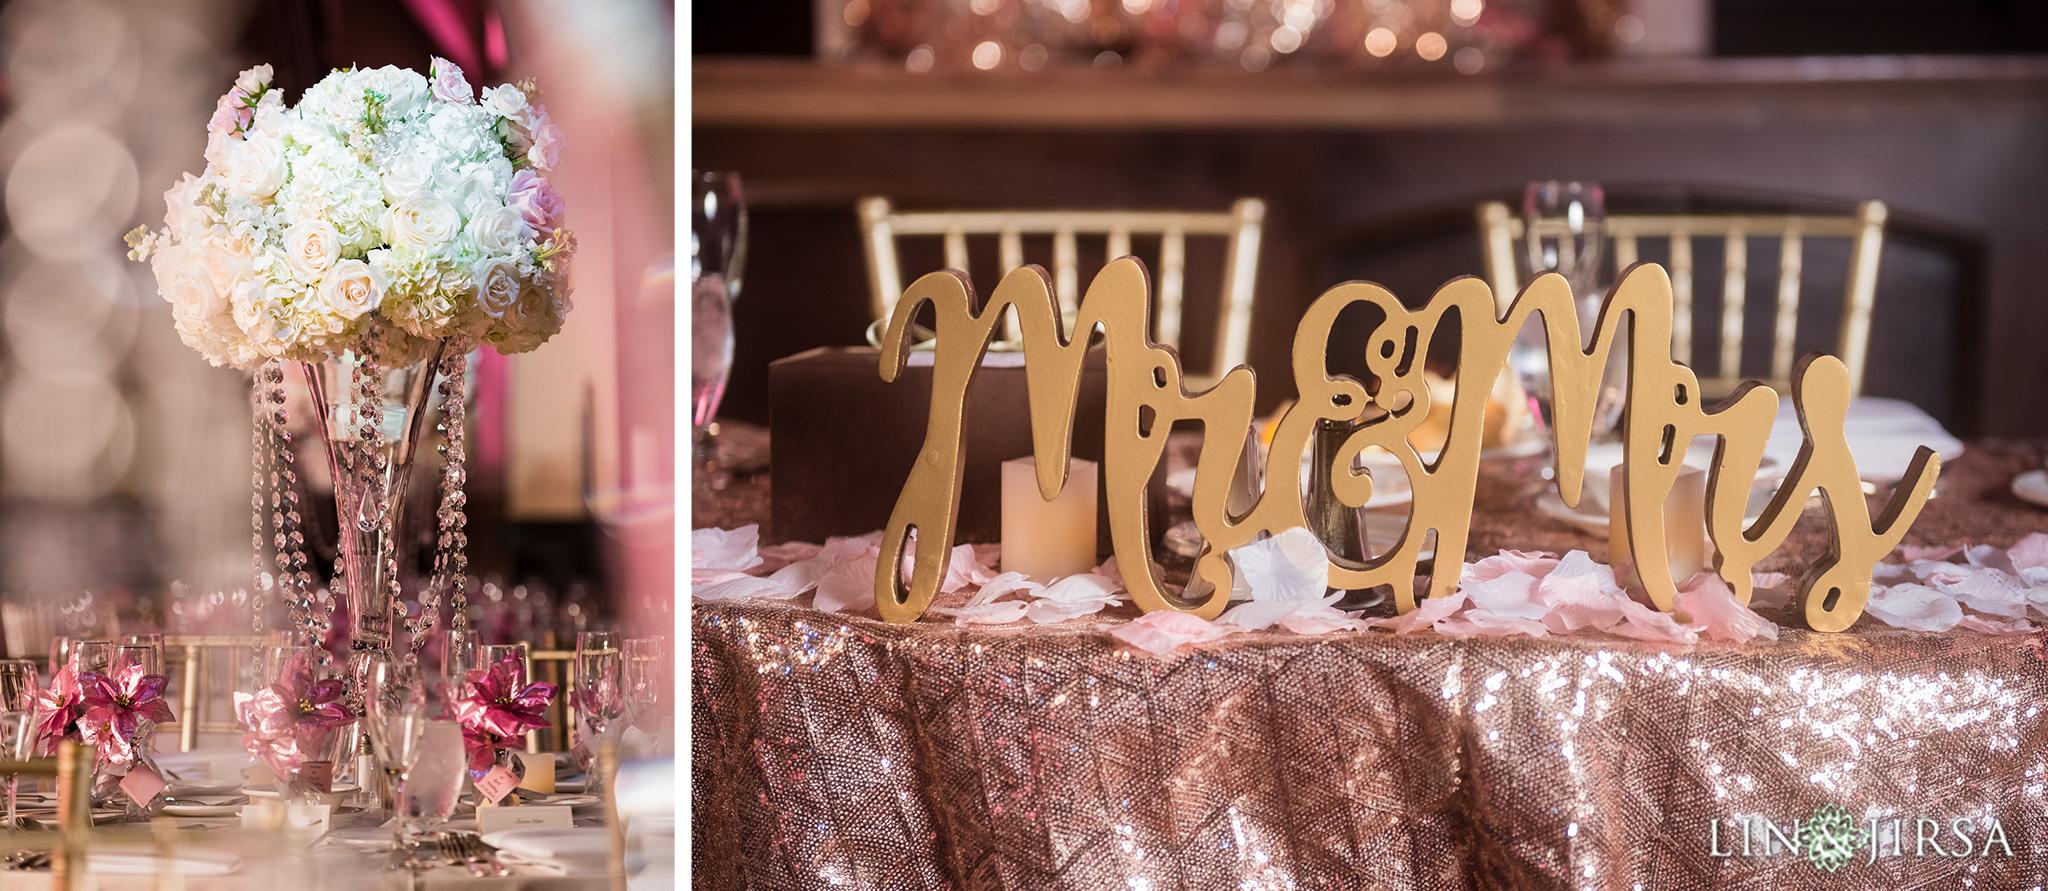 22-mission-inn-riverside-wedding-photography